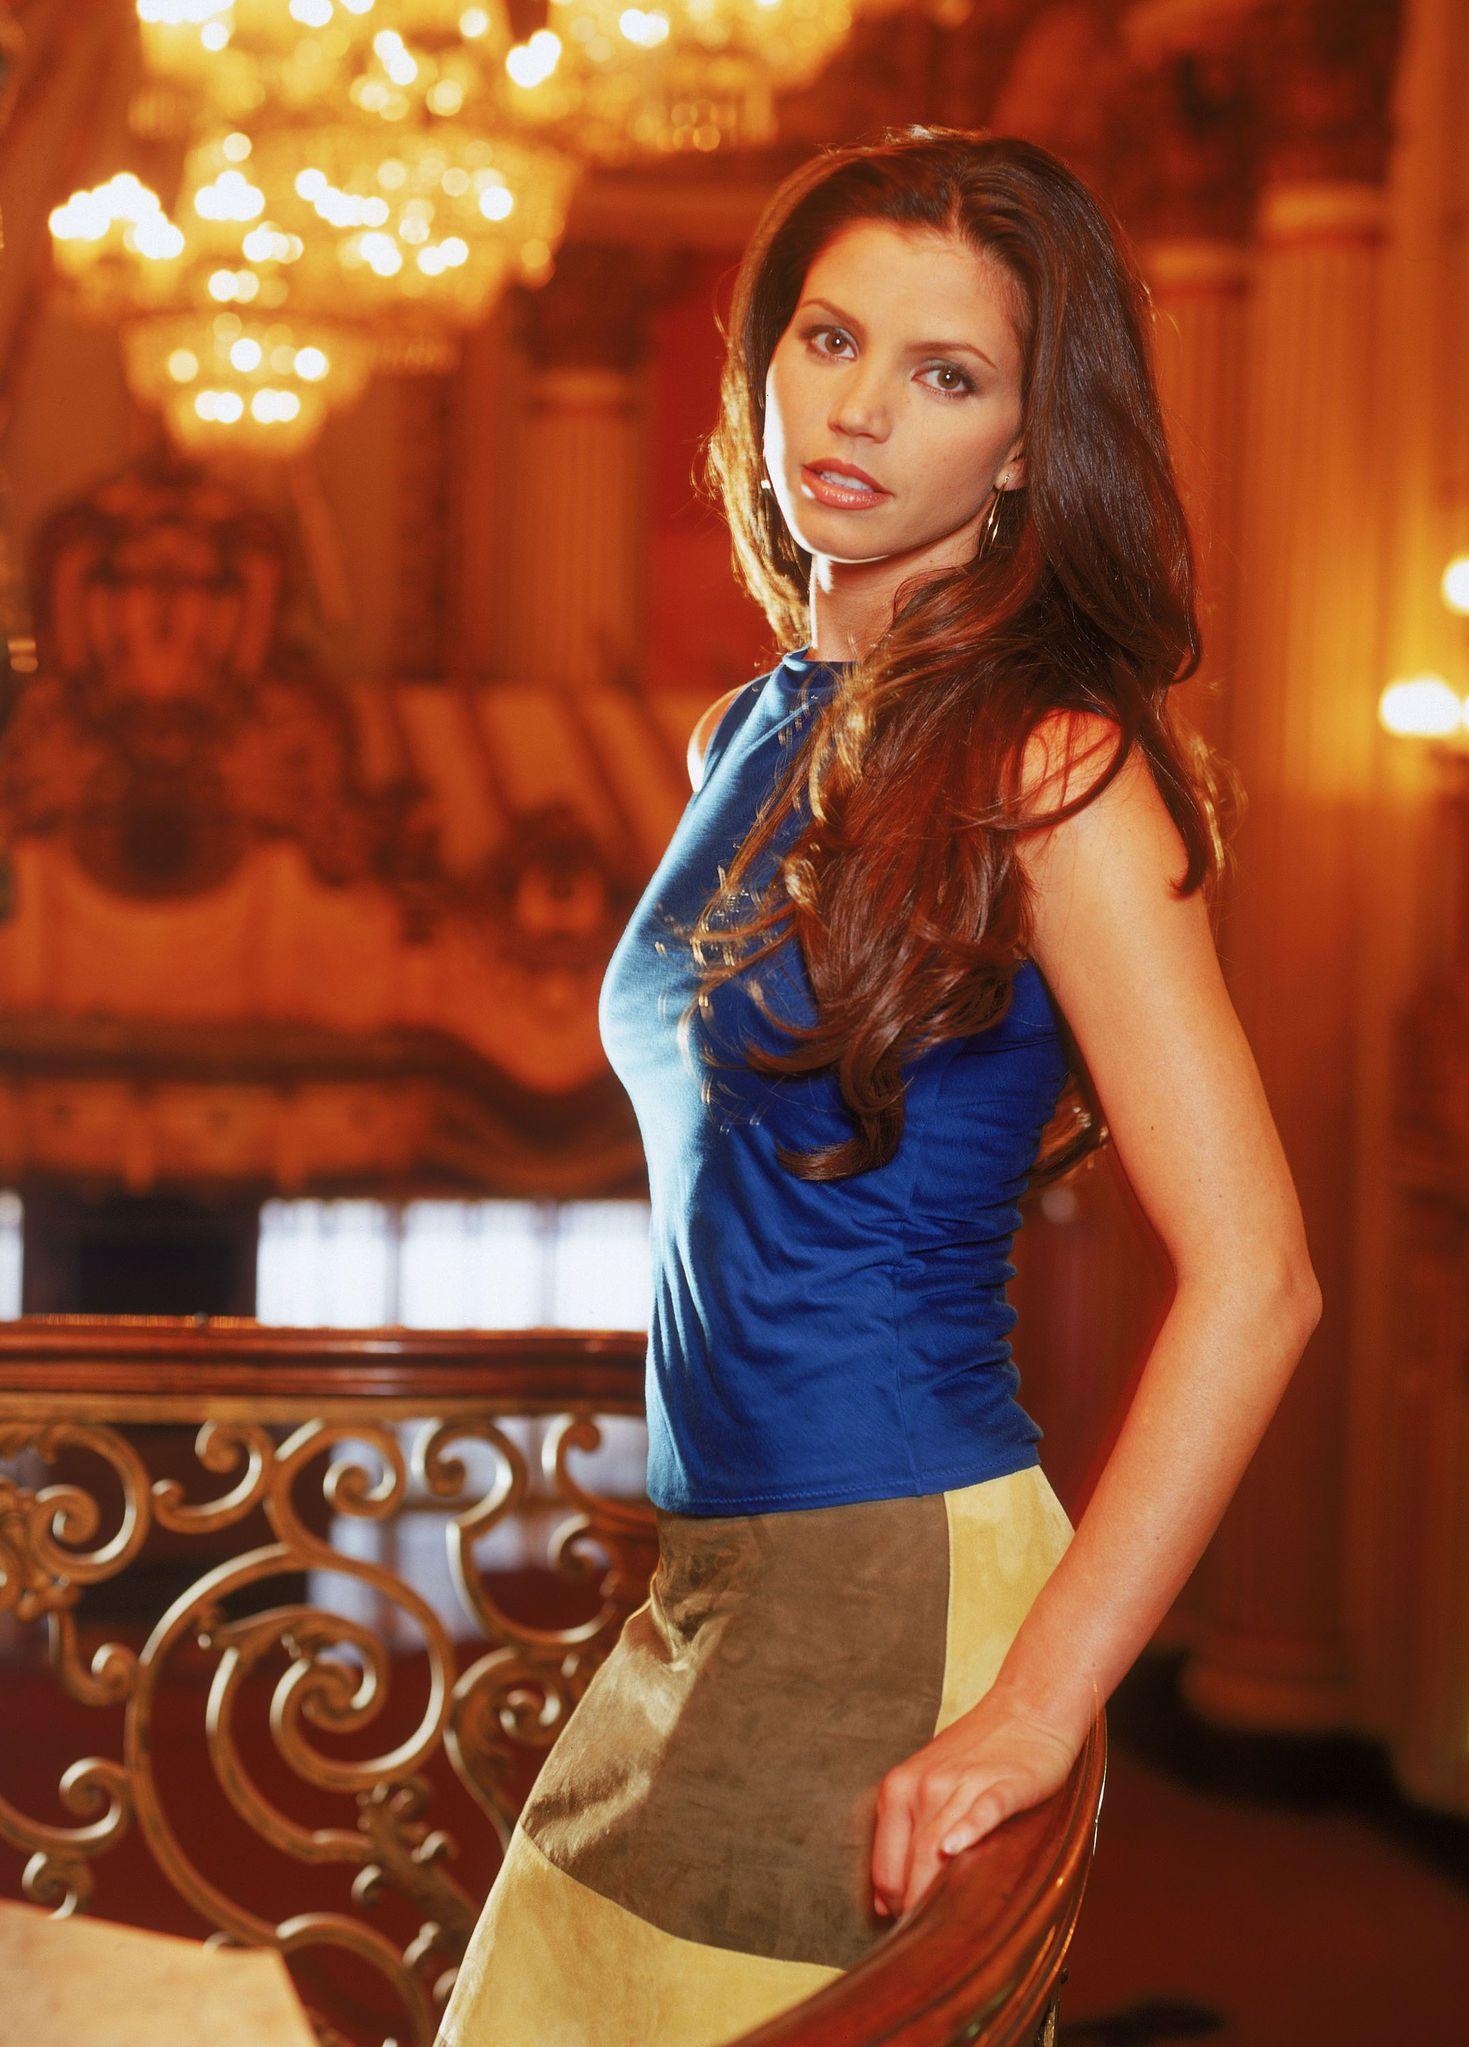 Angel Season 2 Promo Buffy The Vampire Slayer Charisma Carpenter Buffy